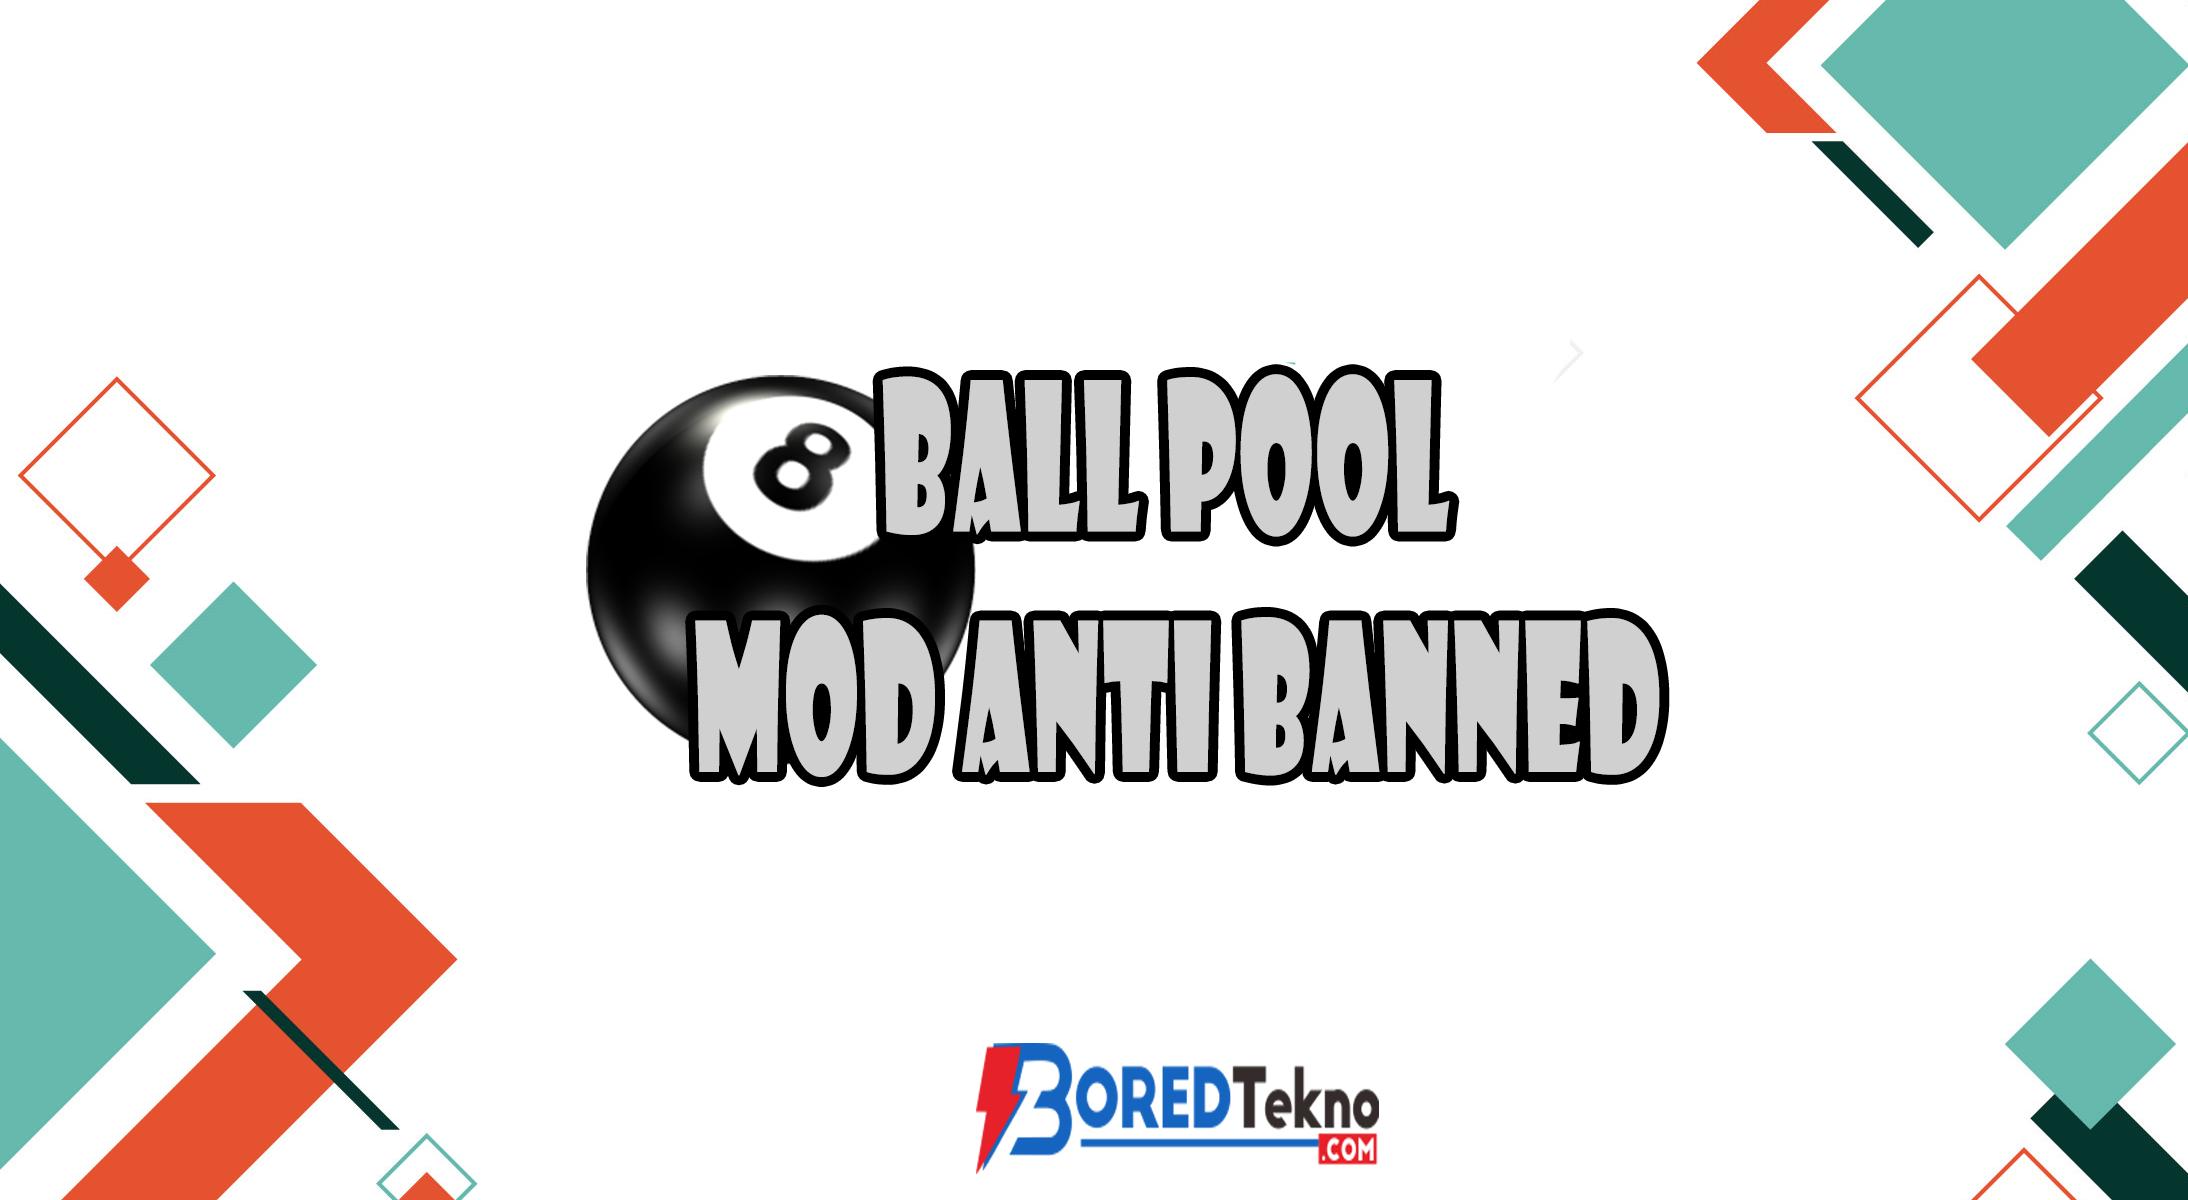 8 Ball Pool MOD Anti Banned